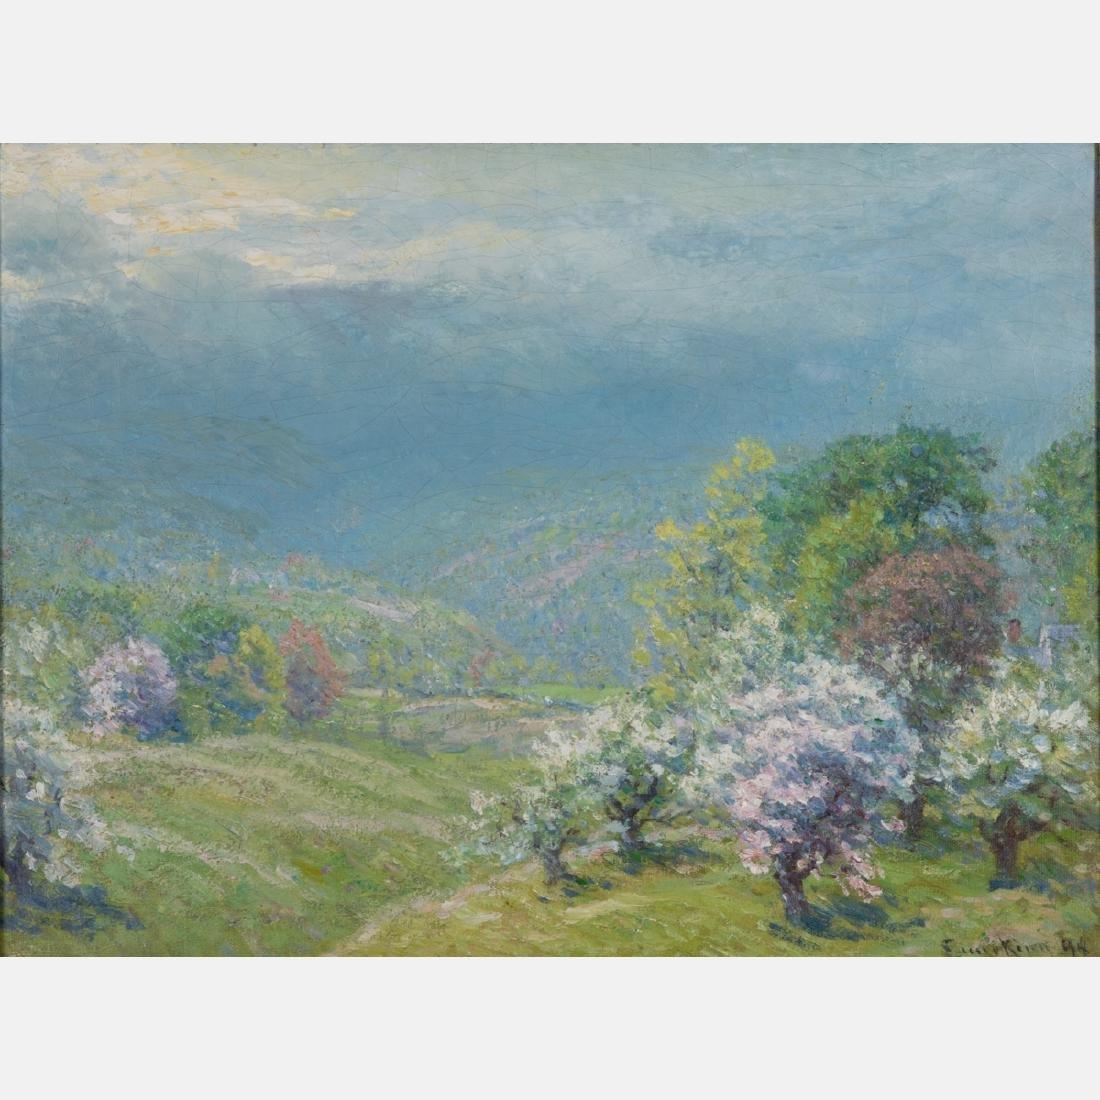 John Joseph Enneking (American, 1841-1916) Blossoming